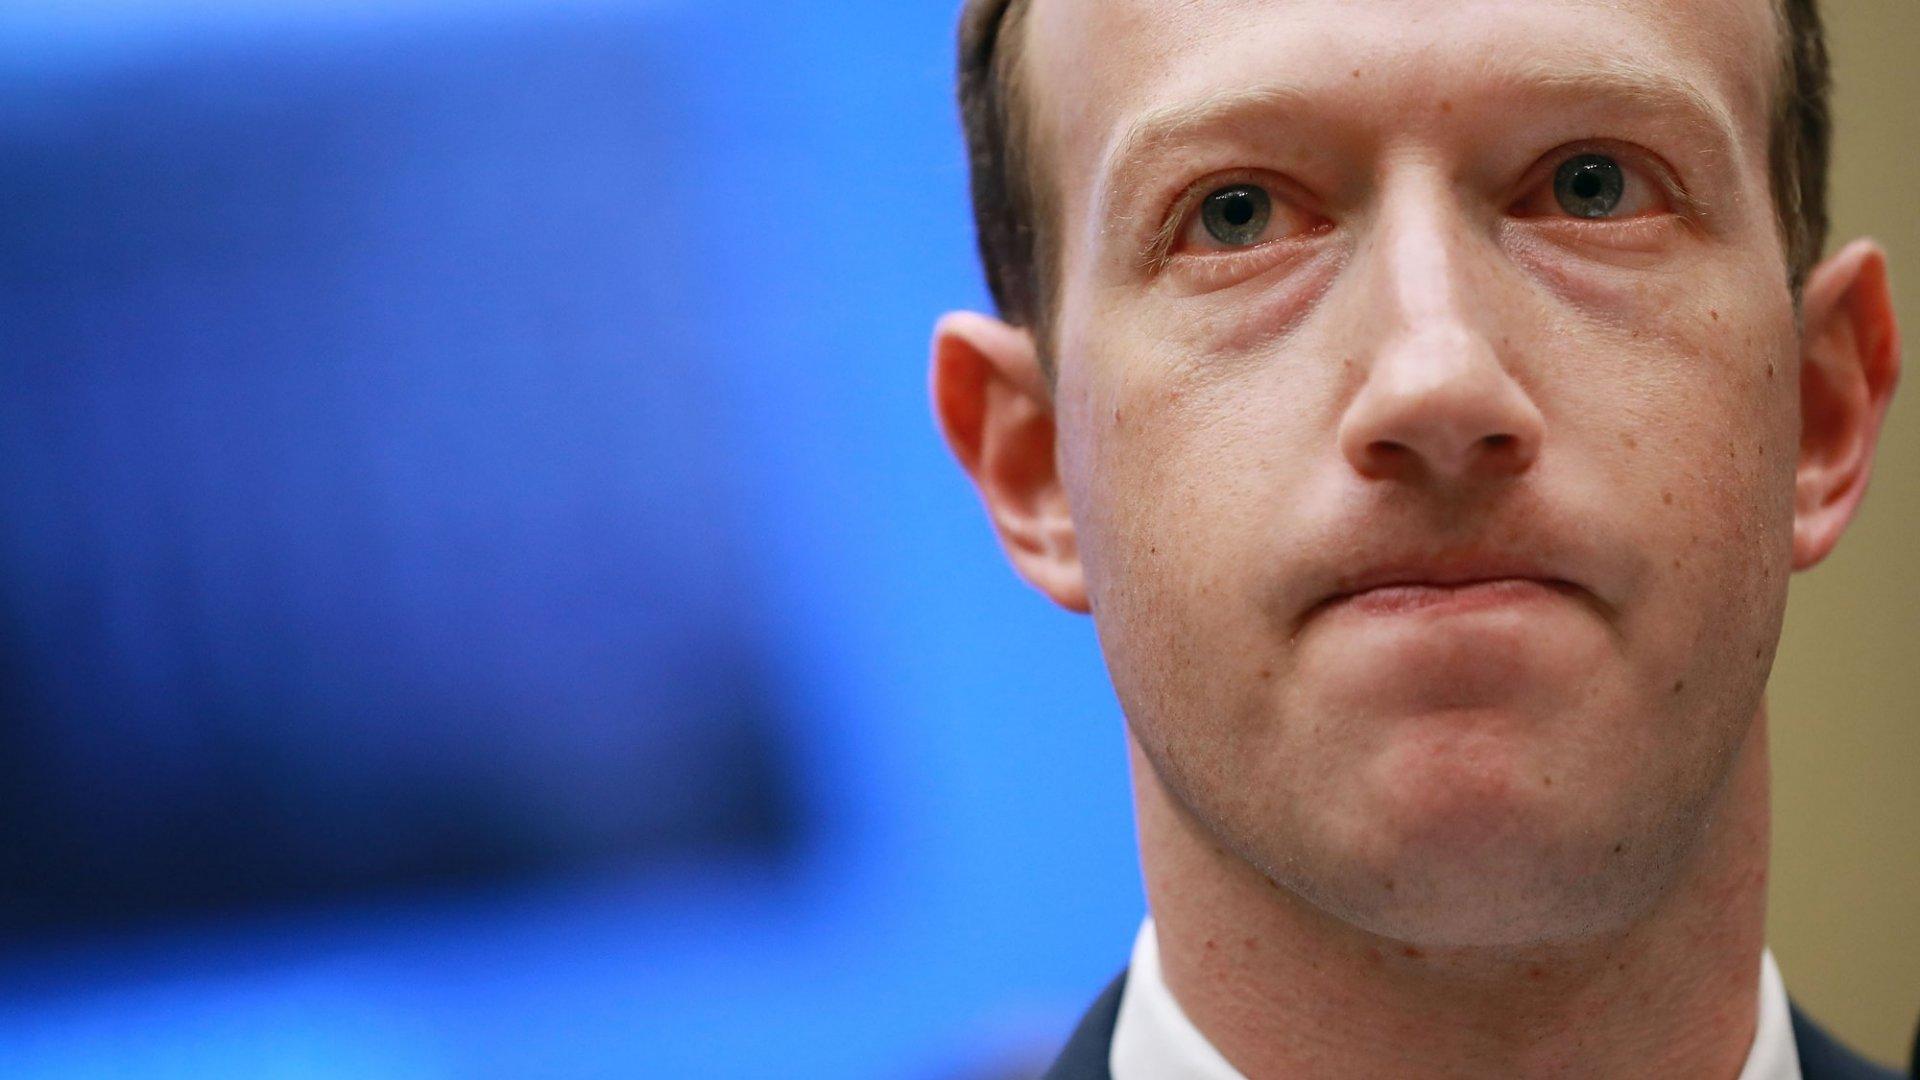 Mark Zuckerberg's Horrible People Skills Are Ruining Facebook's Culture